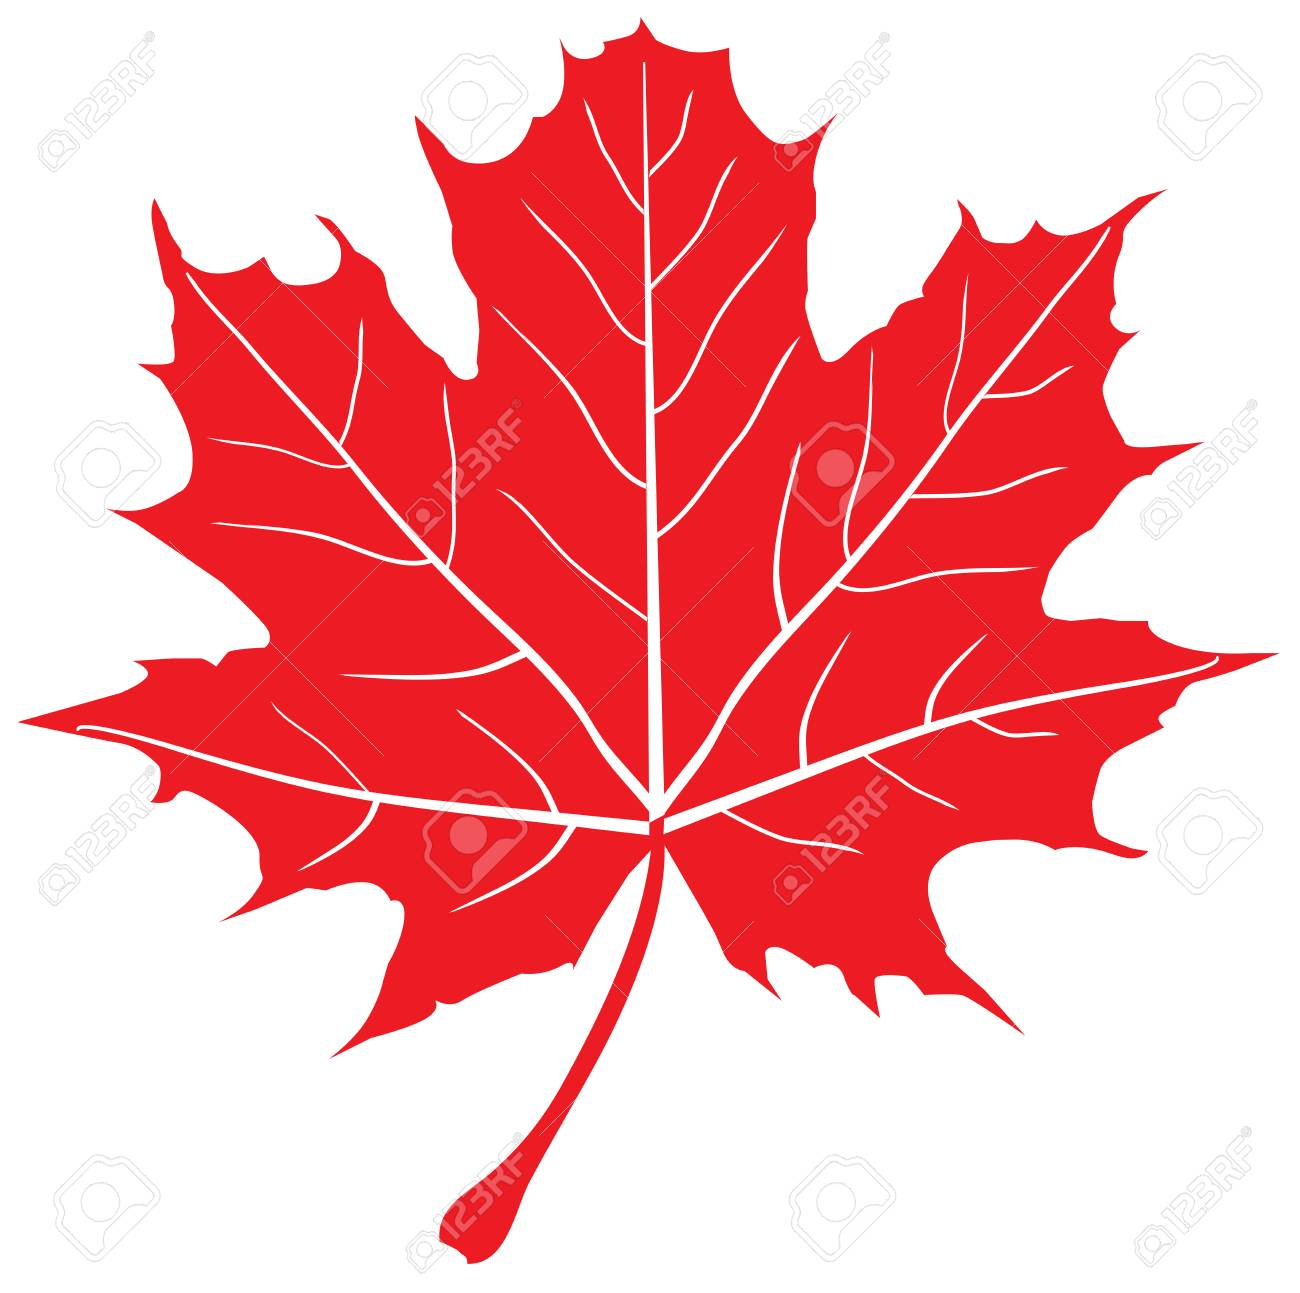 vector illustration of red maple leaf - 58816116